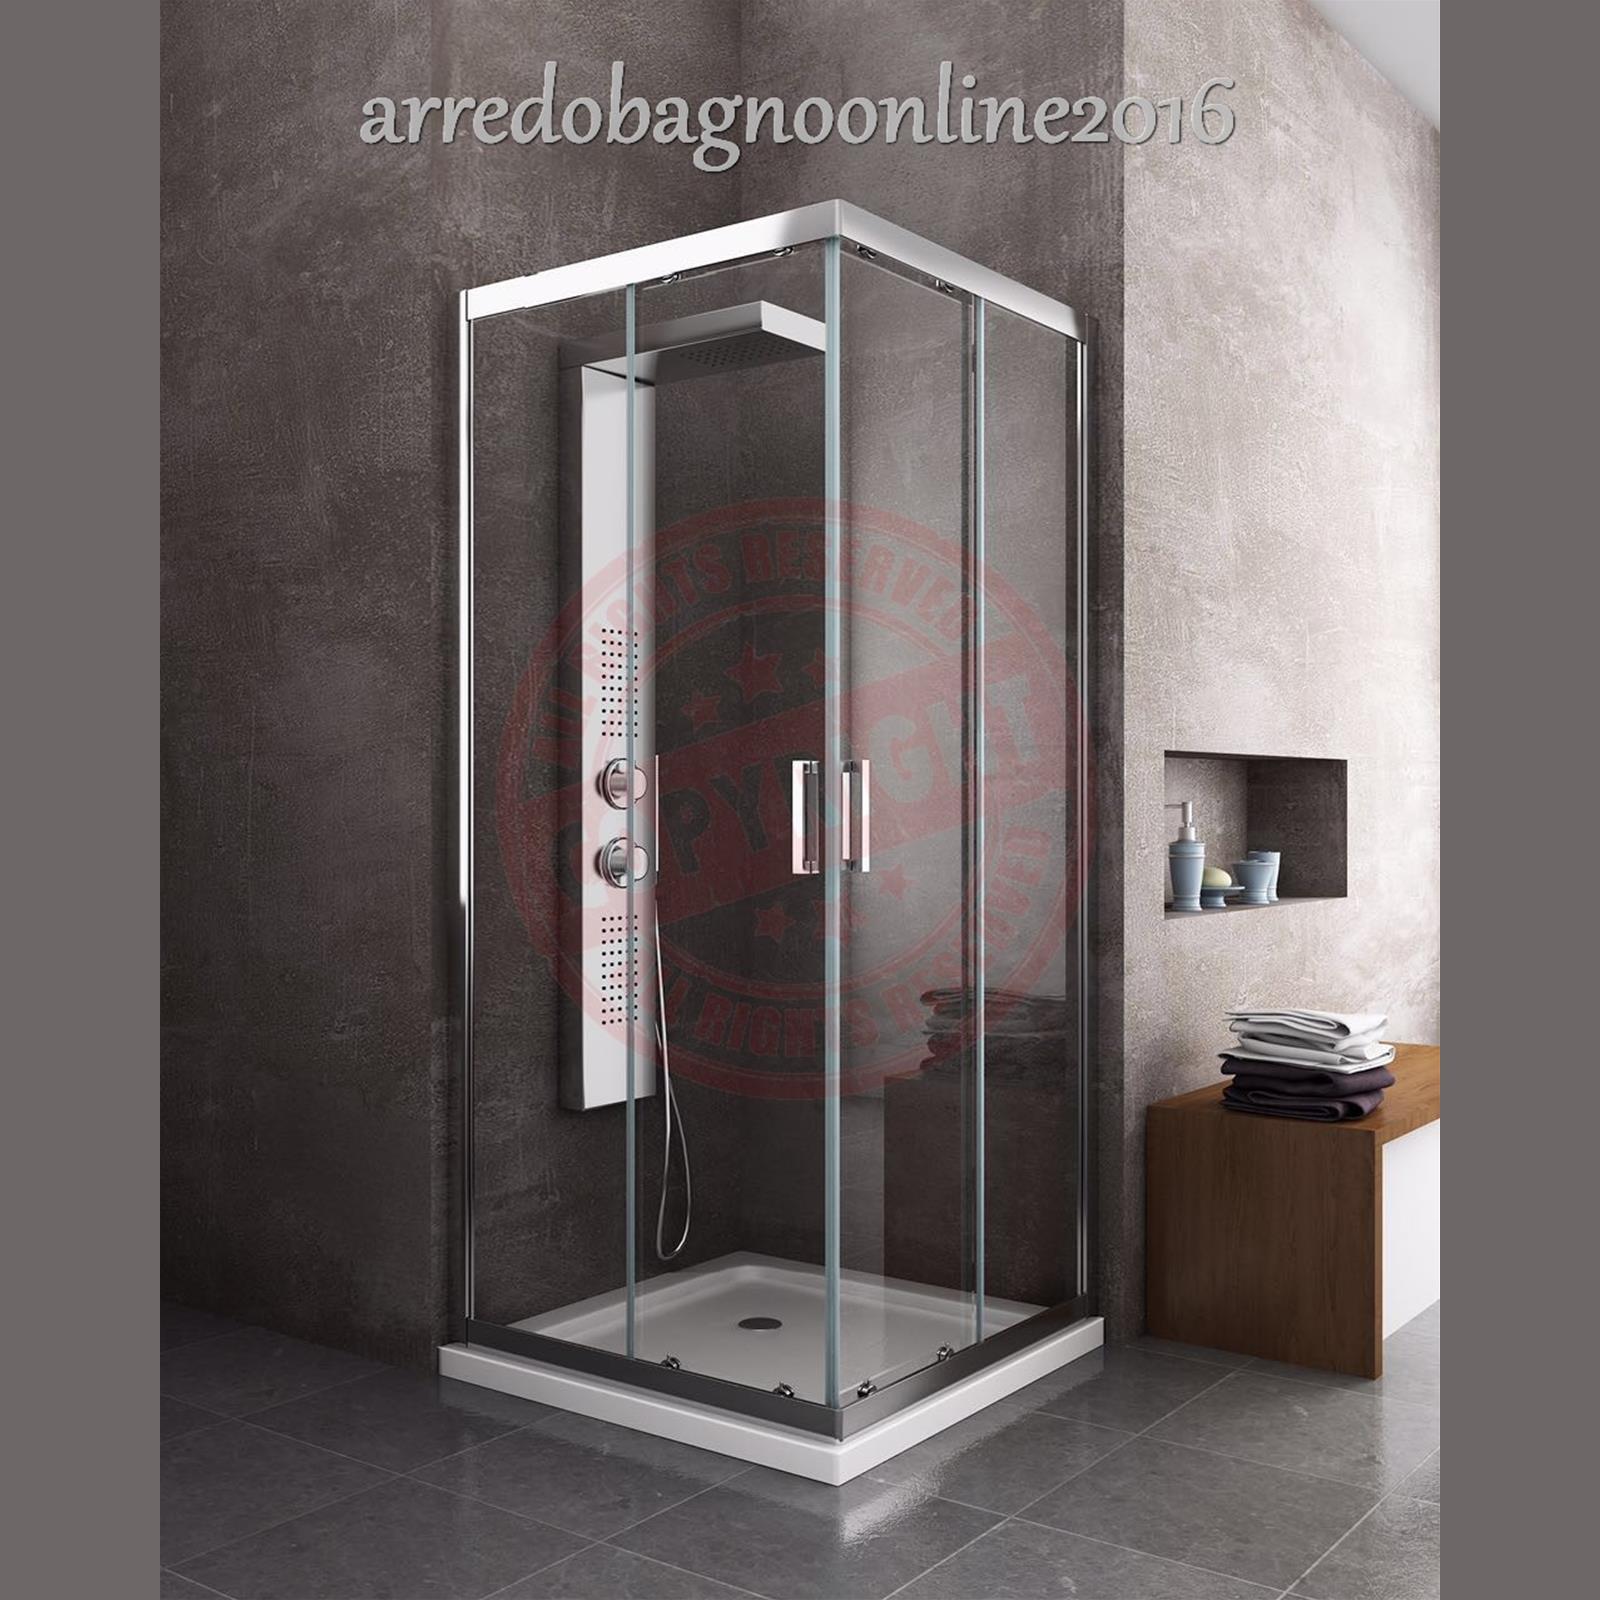 box kabine dusche badezimmer quadratisch 70x70 75x75 80x80 90x90, Badezimmer ideen